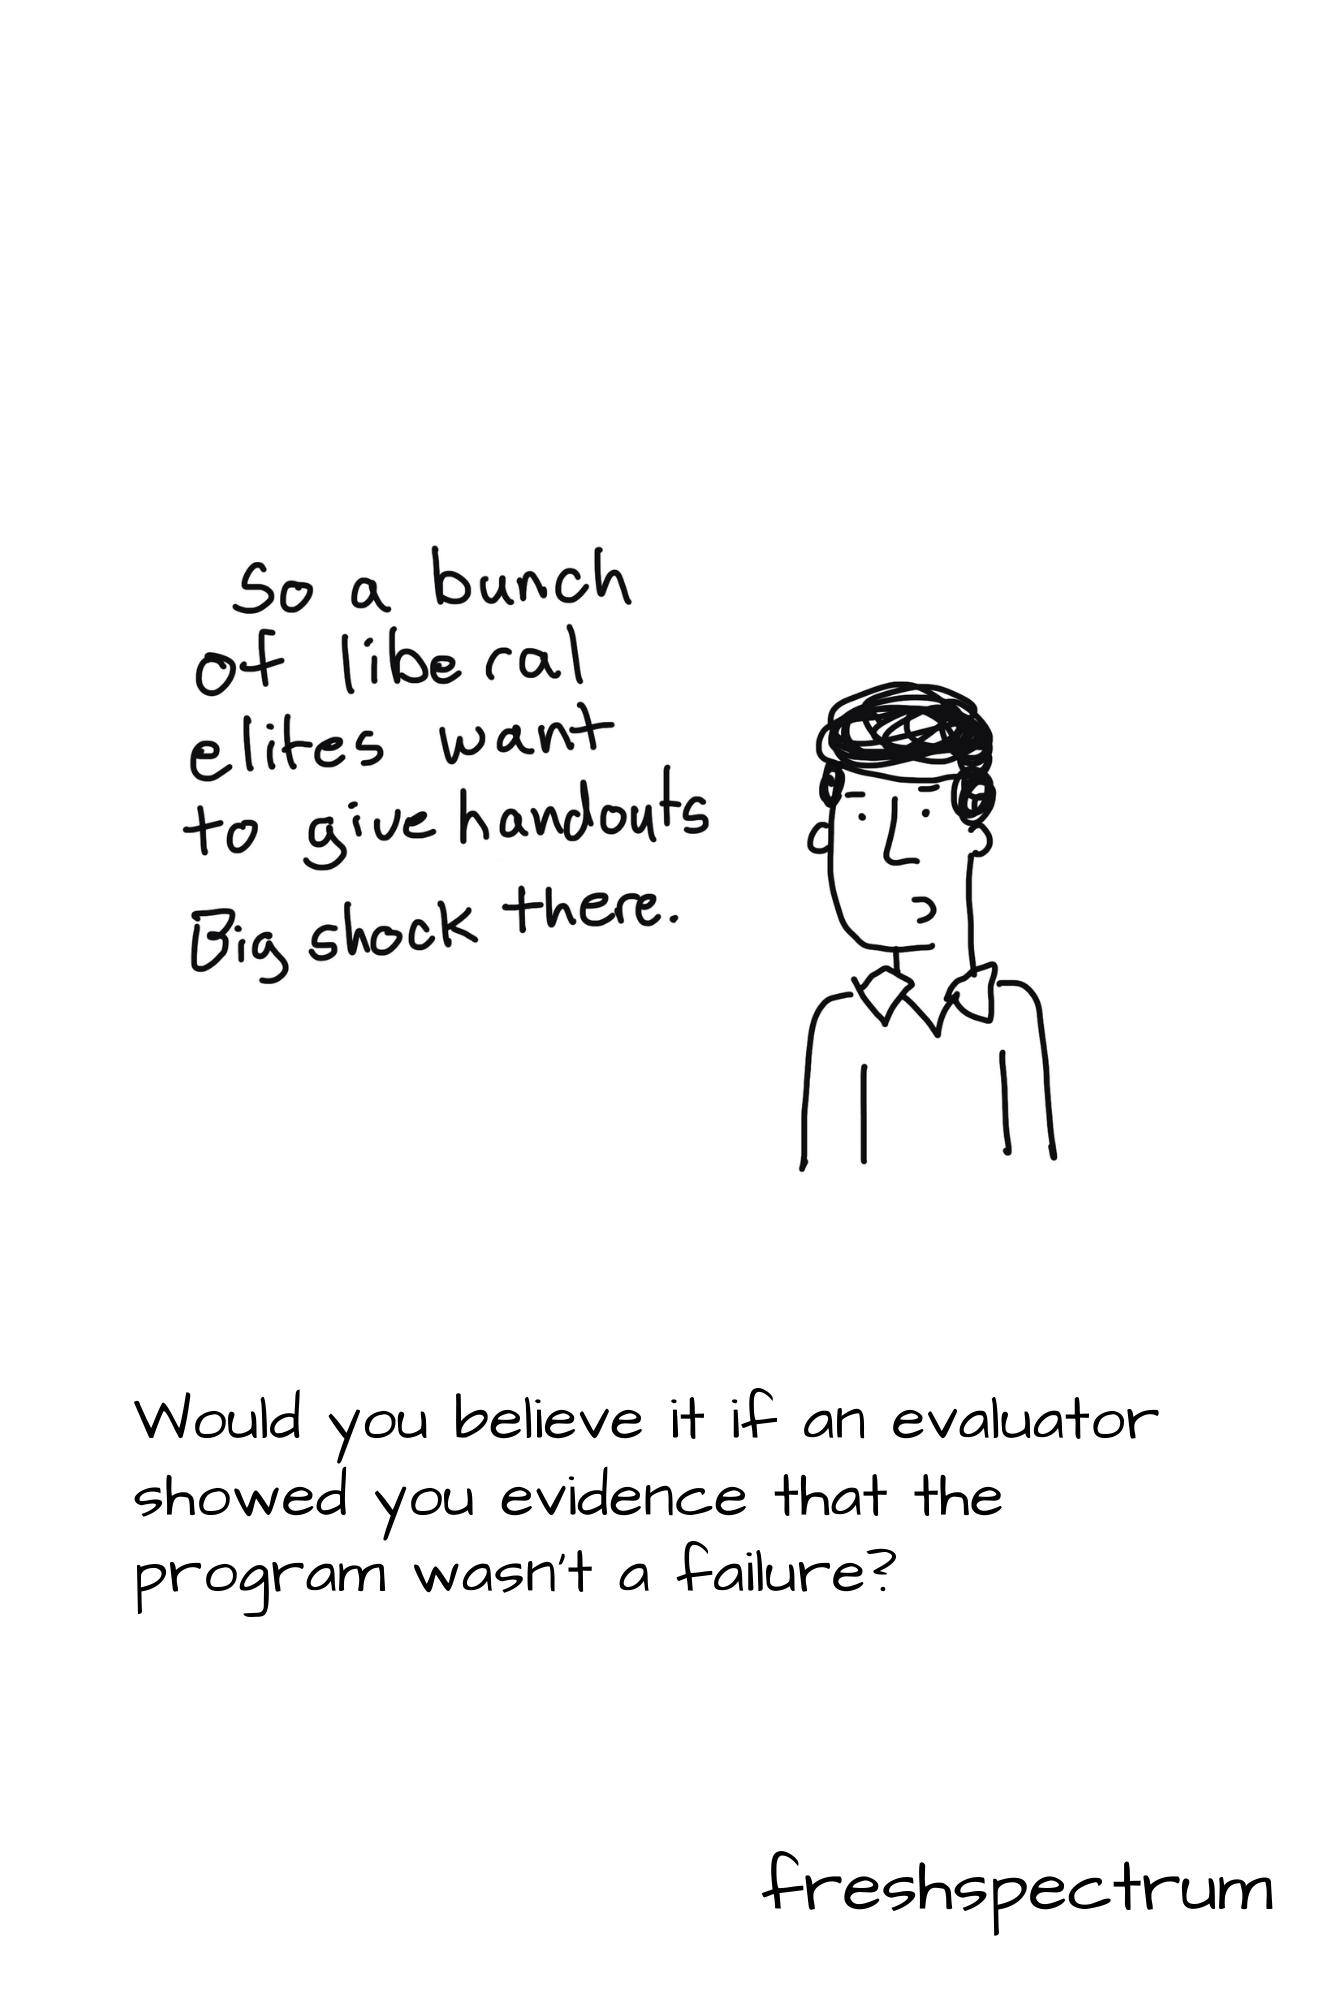 Shrodinger's Outcome Graphic Novella by Chris Lysy of freshspectrum.com.  Illustration 12.